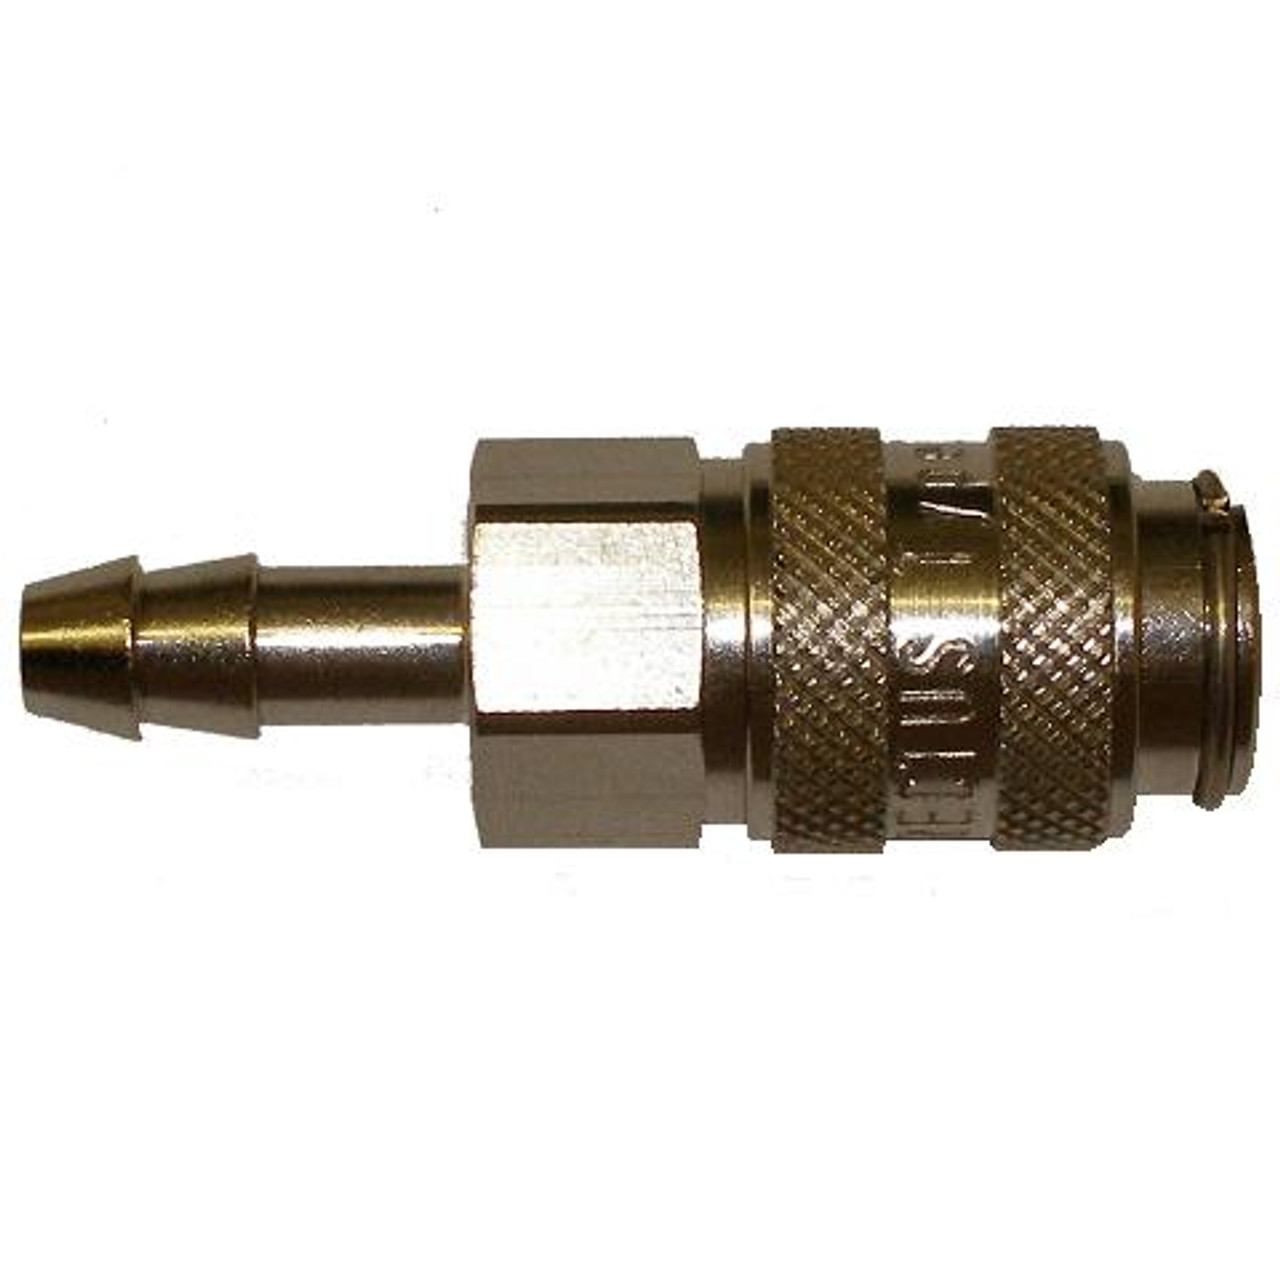 Coupler 6mm - Steel Hosetail Rectus